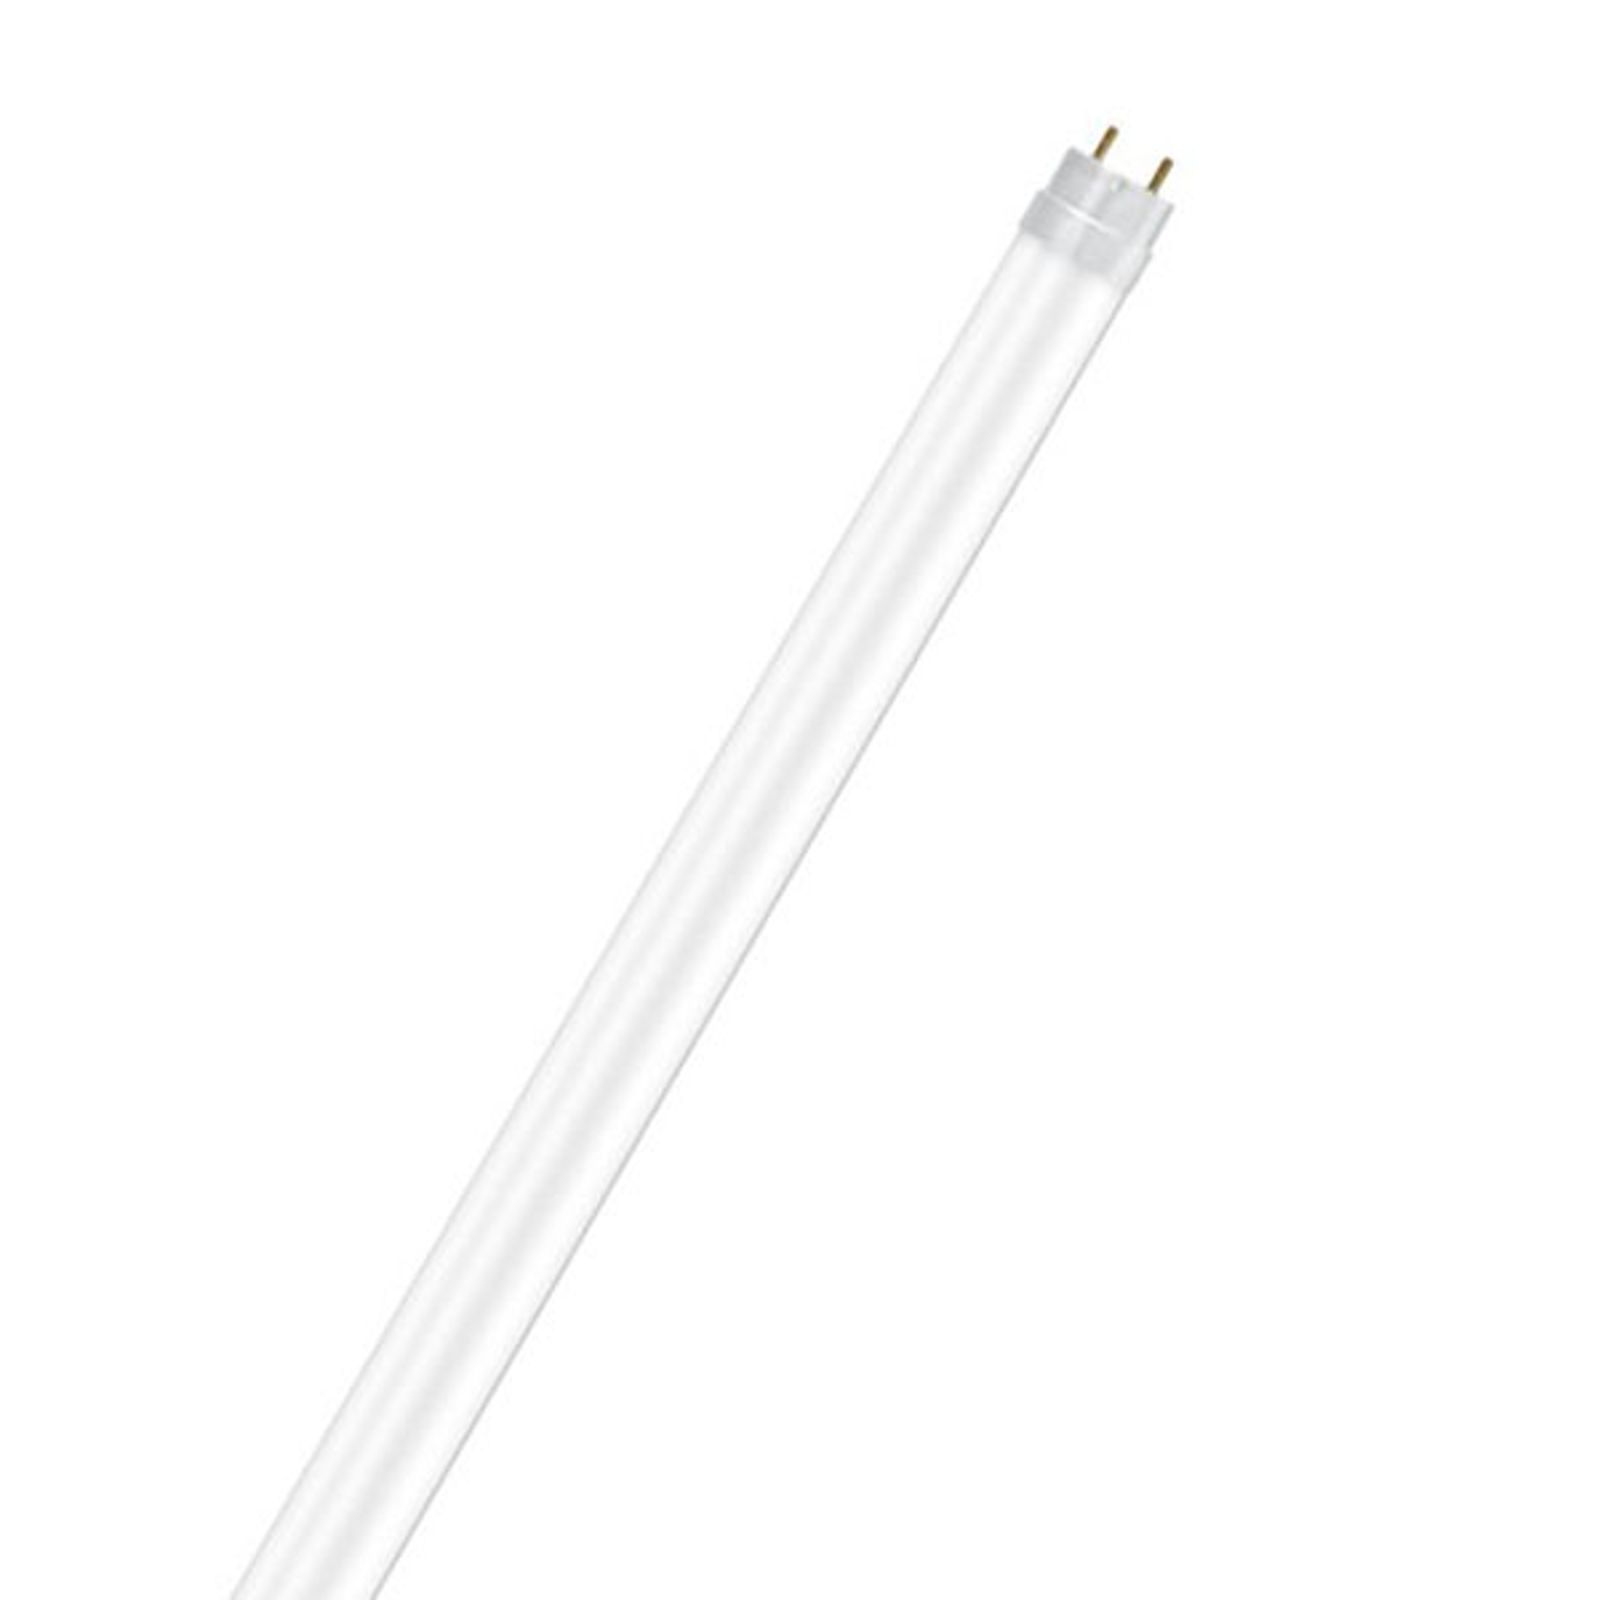 OSRAM-LED-putki G13 120cm SubstiTUBE 16W 4 000 K